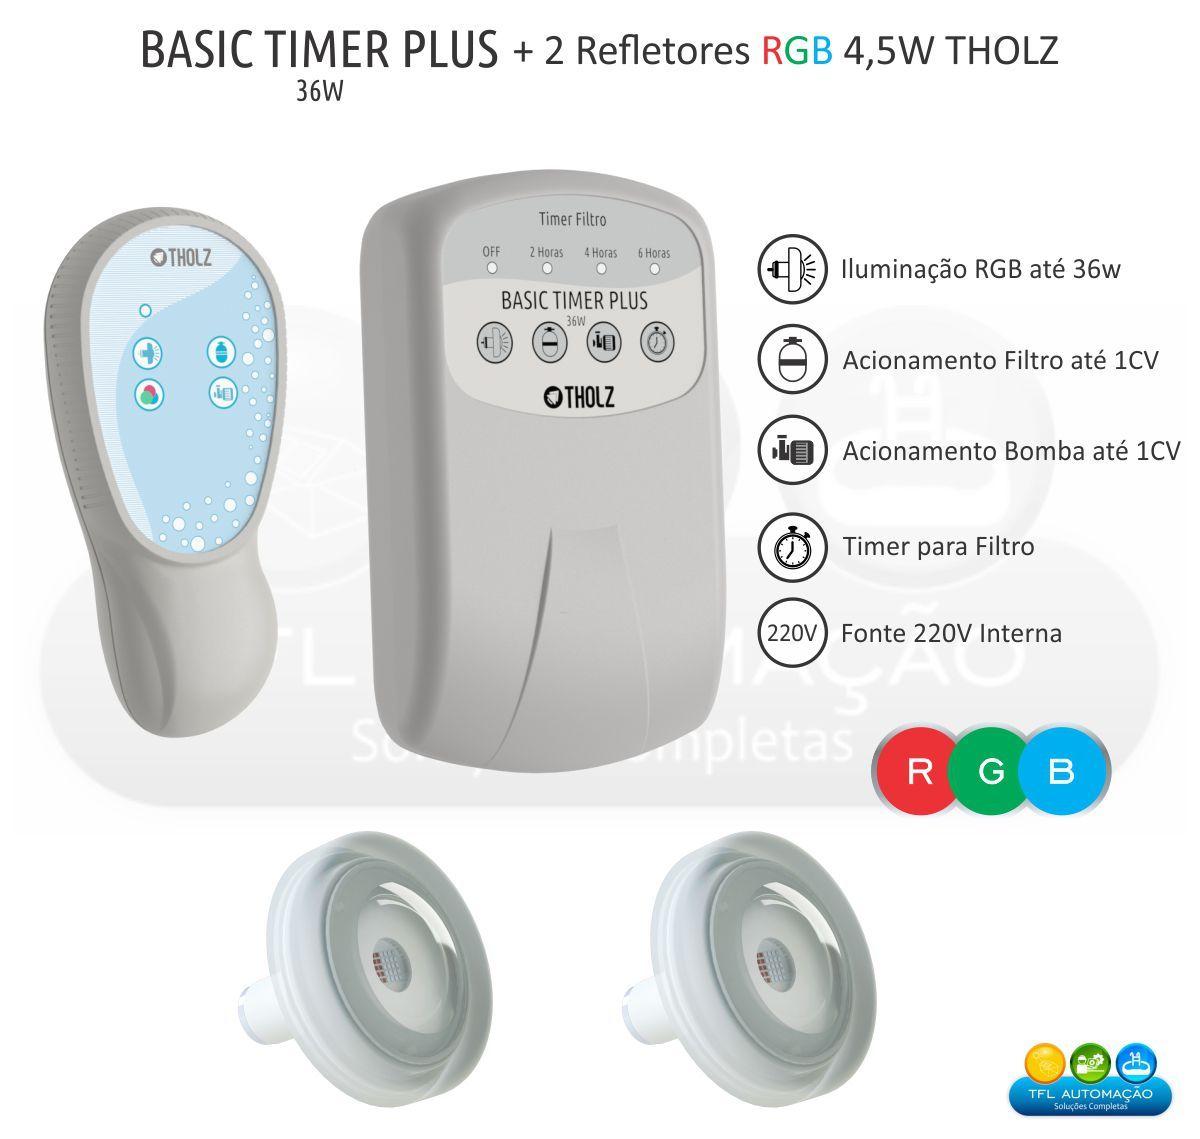 Kit Iluminação Piscina -  2 Leds Rgb 4,5w Tholz + Basic Timer Plus 36w